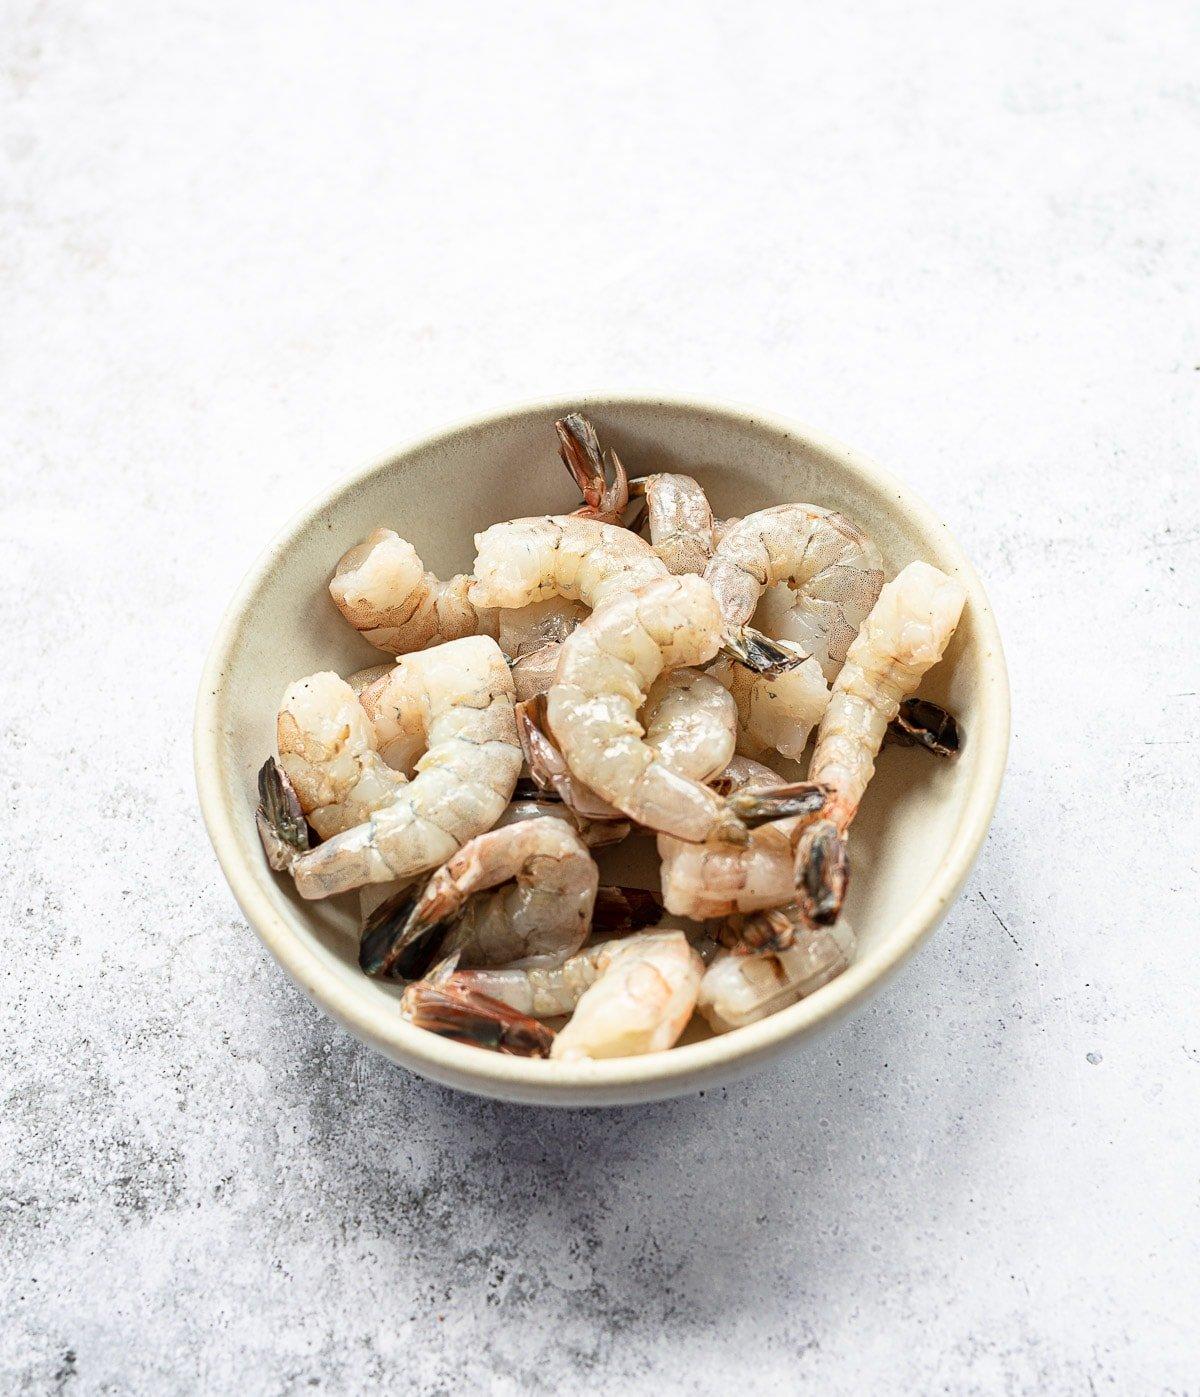 A bowl of raw peeled shrimp